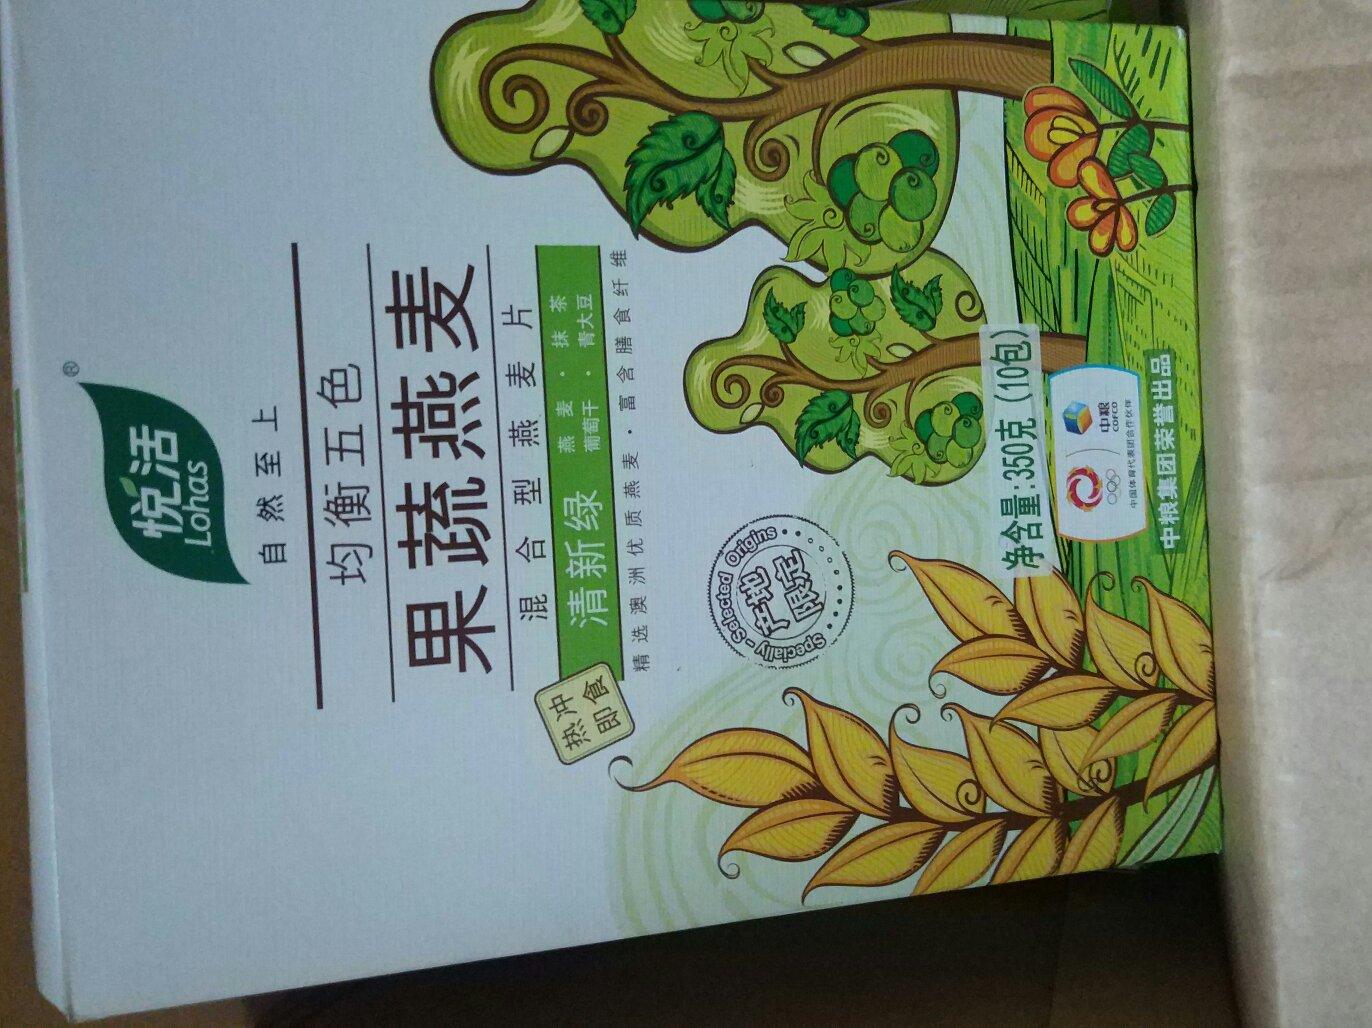 asics gel kayano 18 womens size 11.5 00920775 wholesale